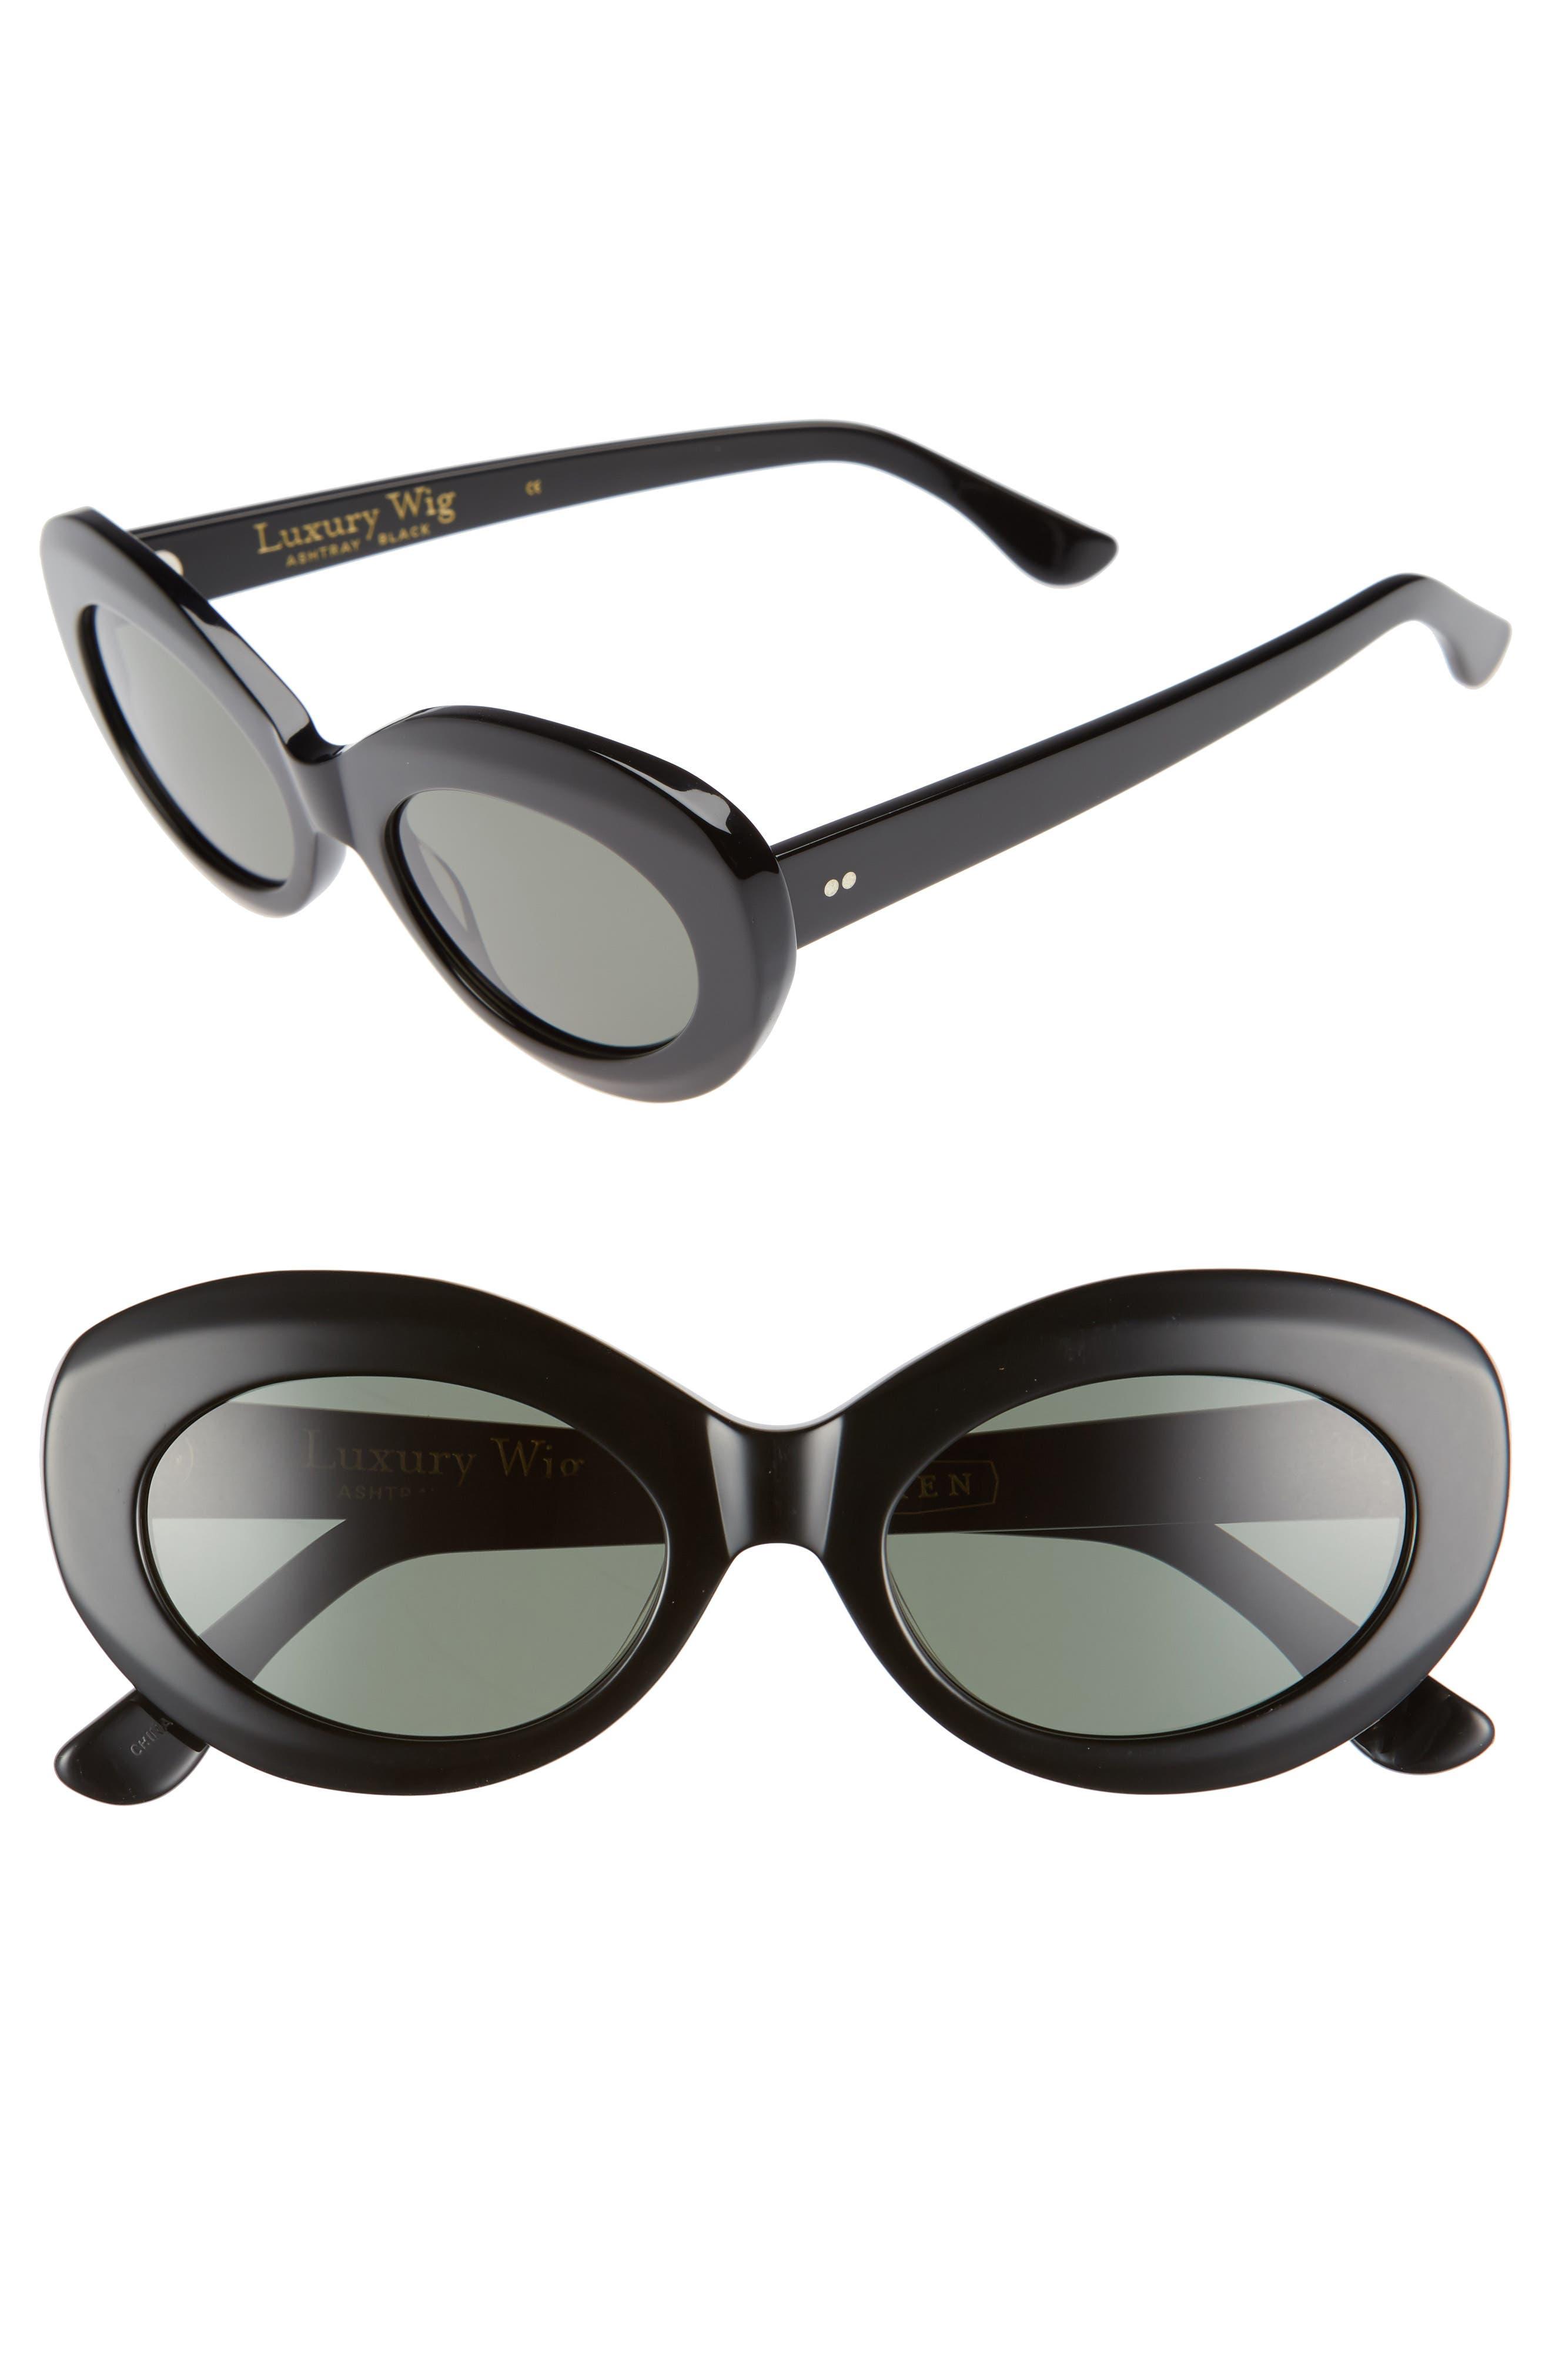 x Alex Knost Luxury Wig Ashtray 53mm Sunglasses,                         Main,                         color, Black/ Black